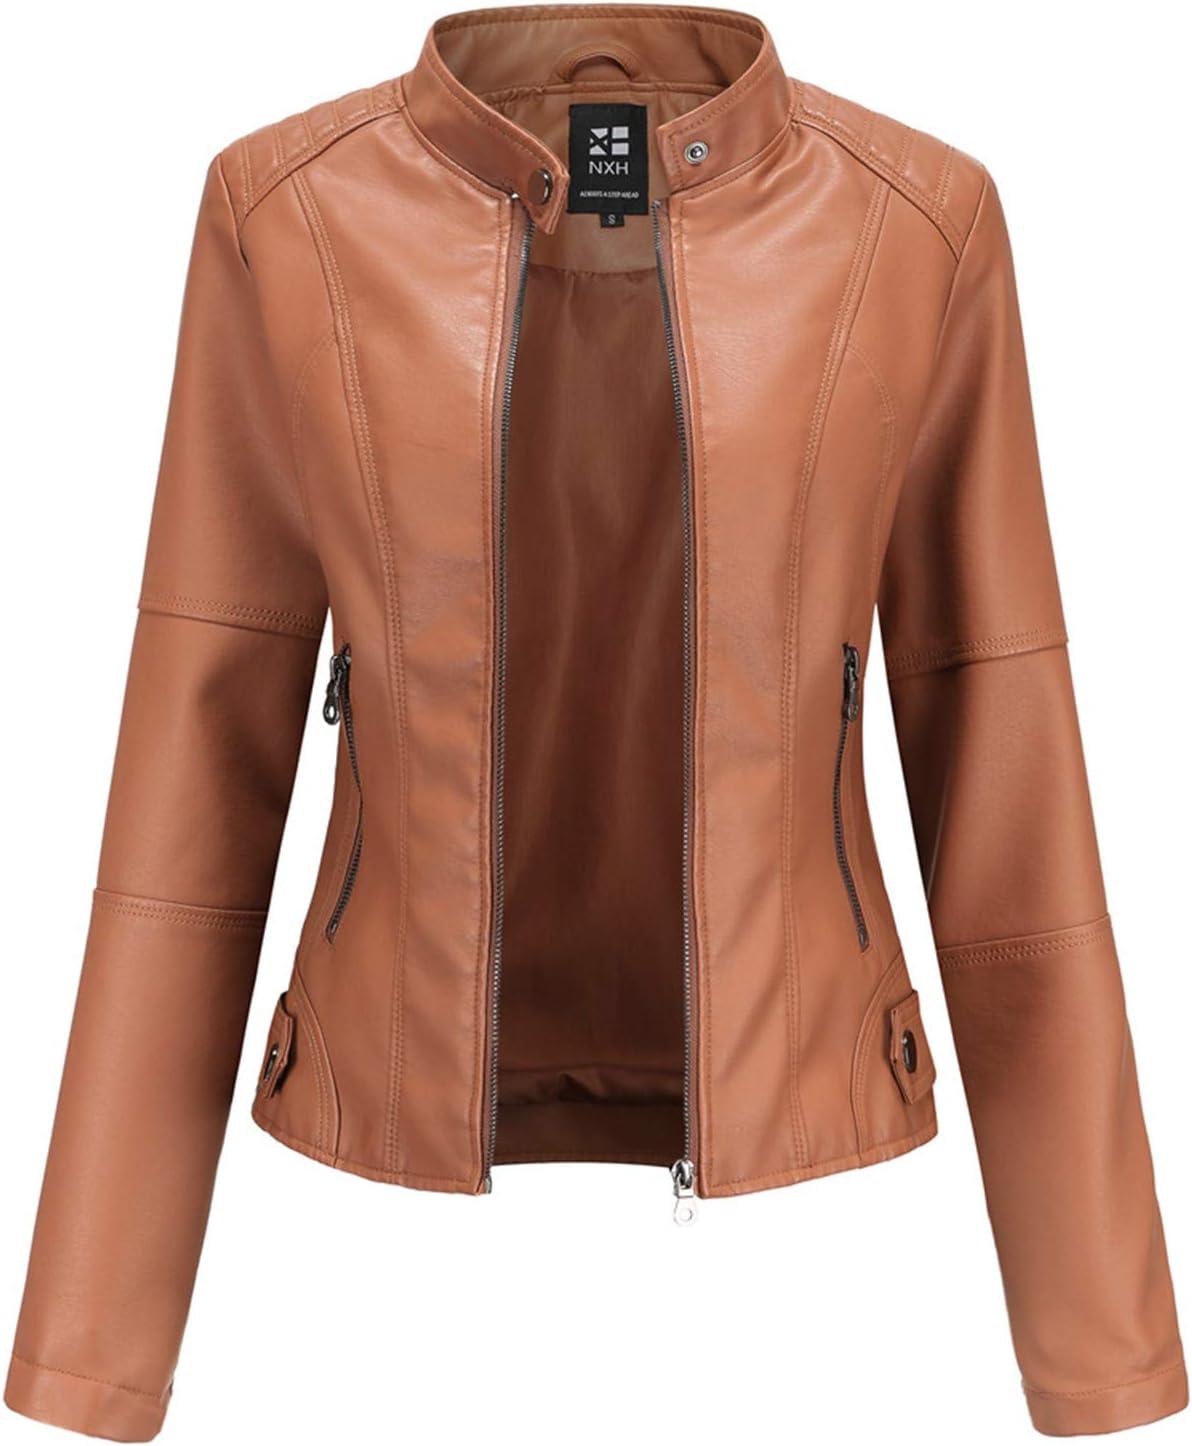 Women's PU Leather Jacket, Faux Moto Biker Slim Fit Jacket with Zip Pockets, Slim Fit Outwear Vintage Short Coat for Autumn, Spring (5 Colors)